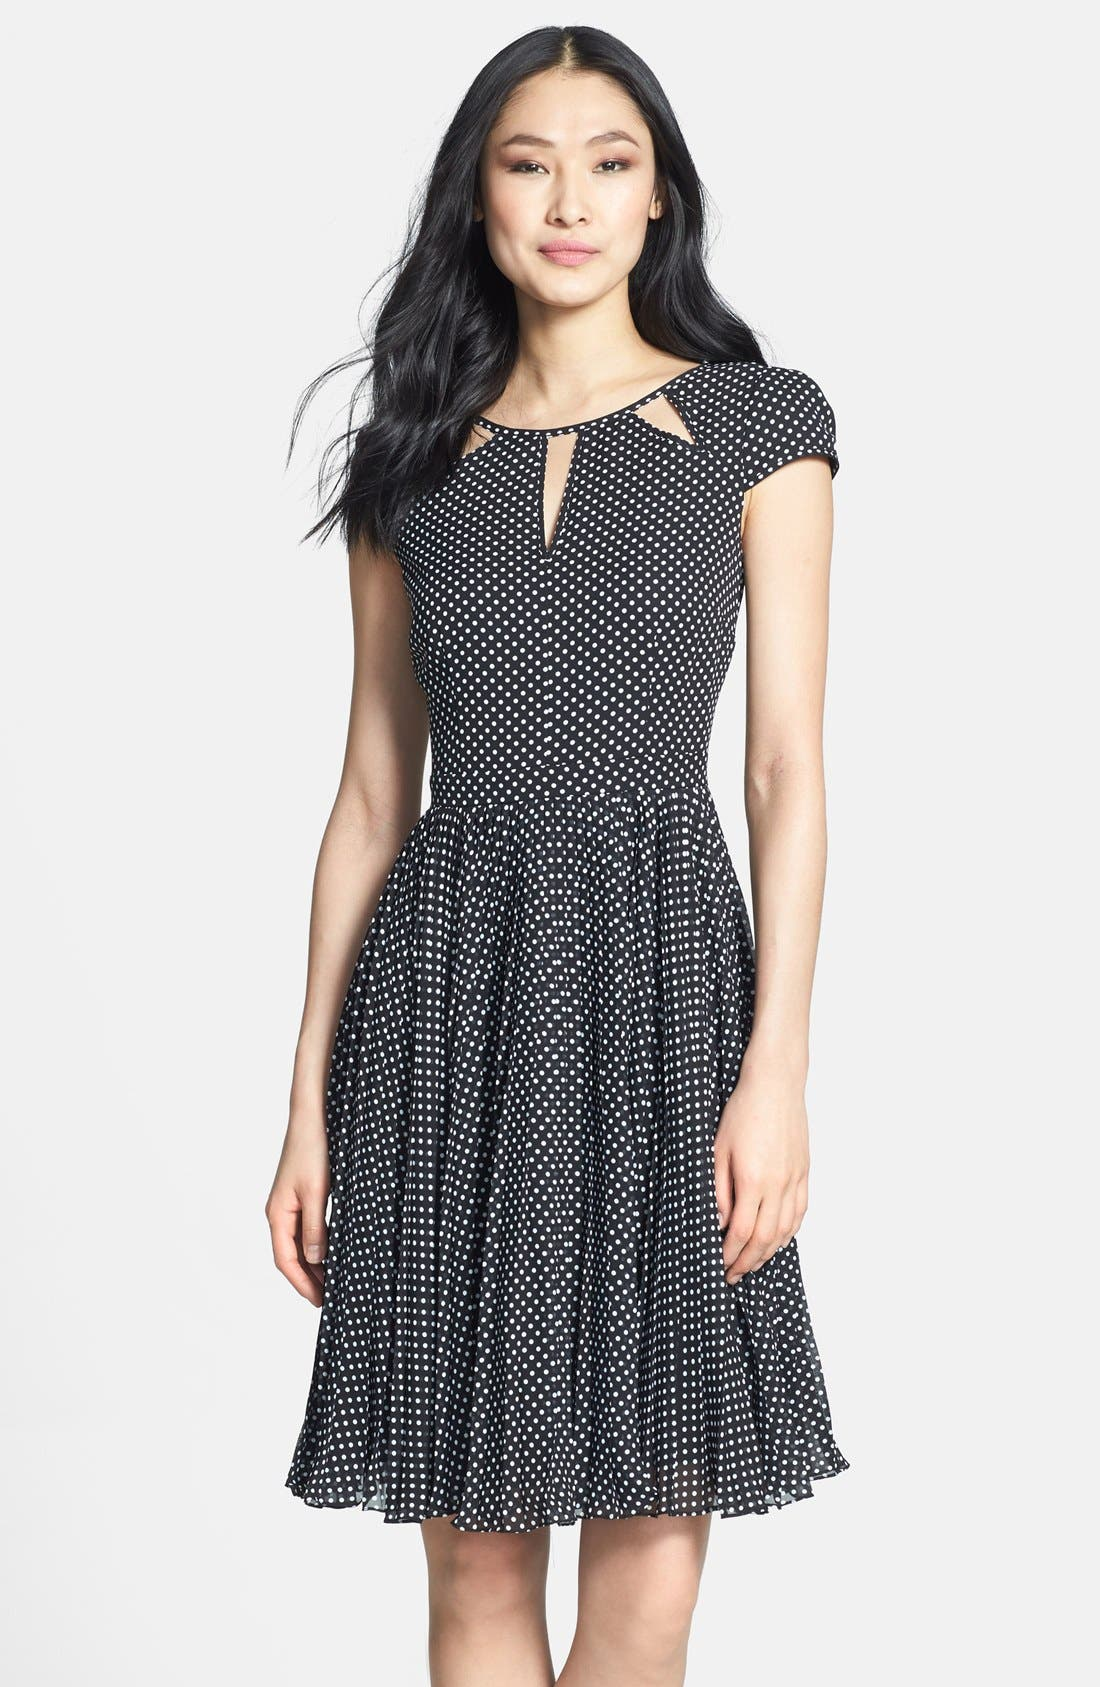 Main Image - Adrianna Papell Polka Dot Cutout Fit & Flare Dress (Regular & Petite)